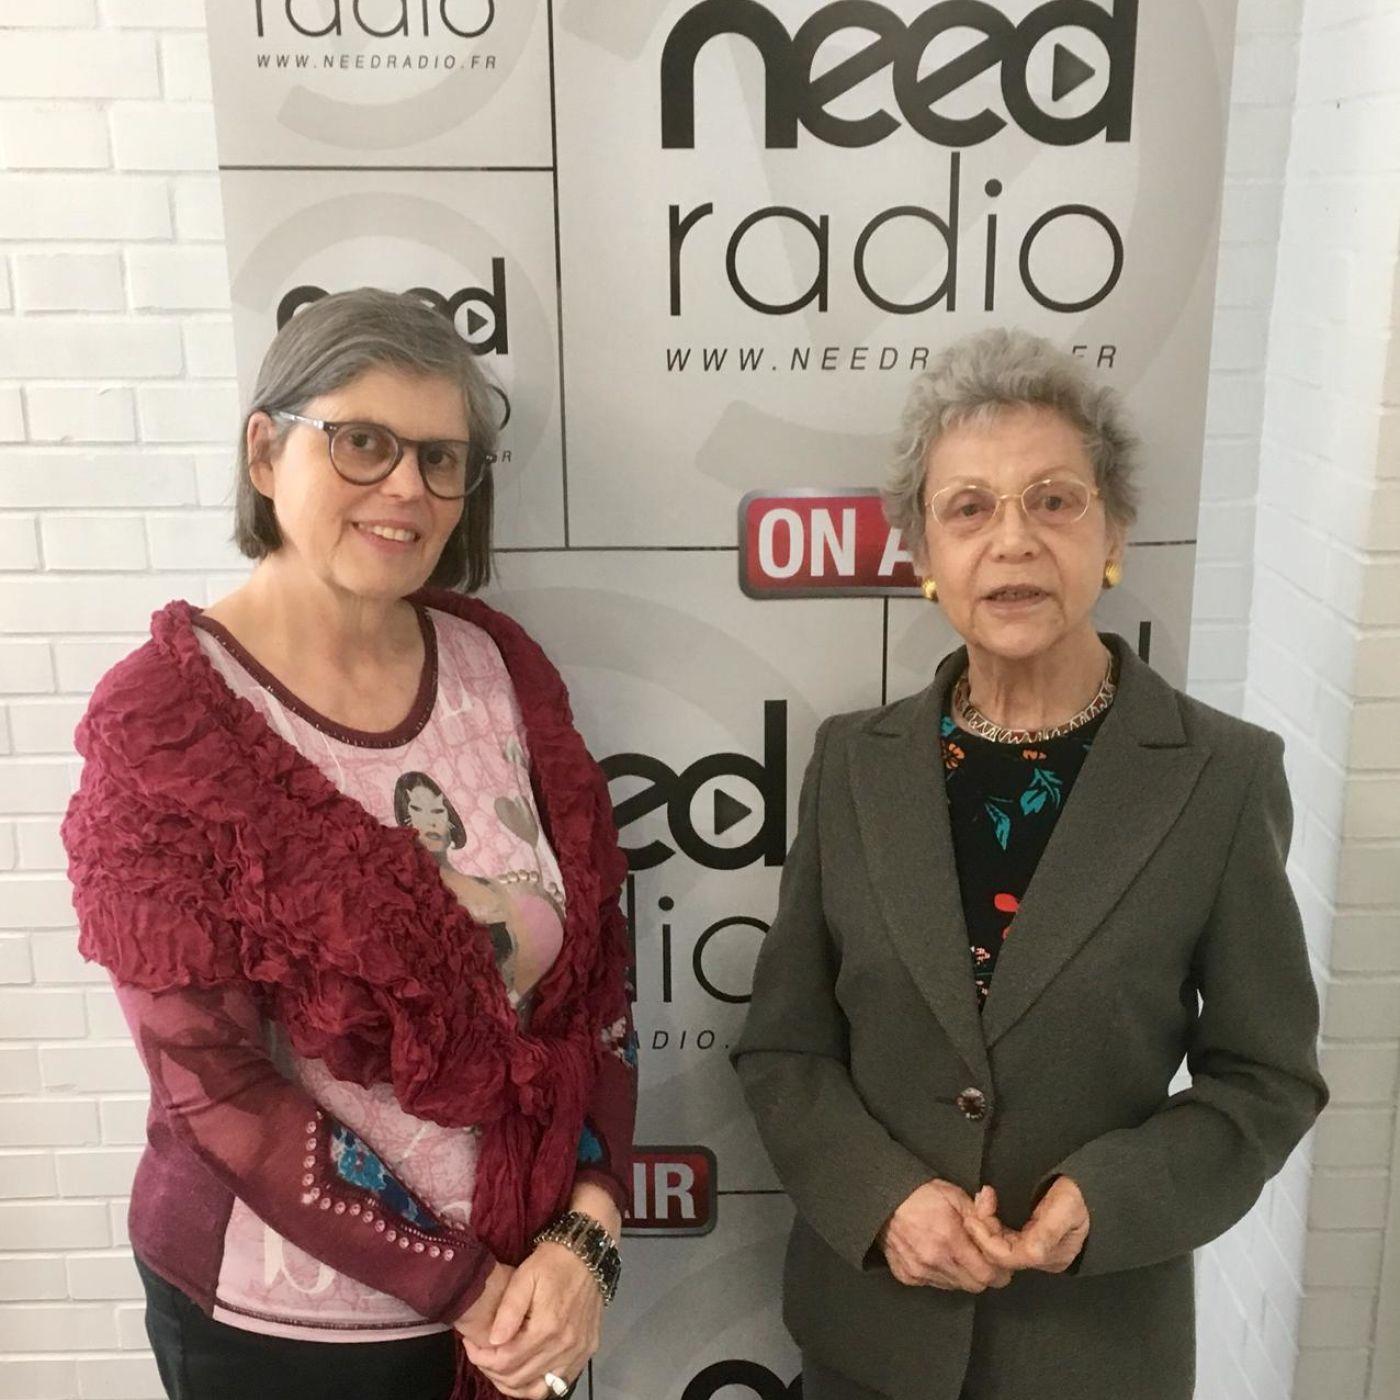 Entre Voix avec Irene Ajer (29/05/19)